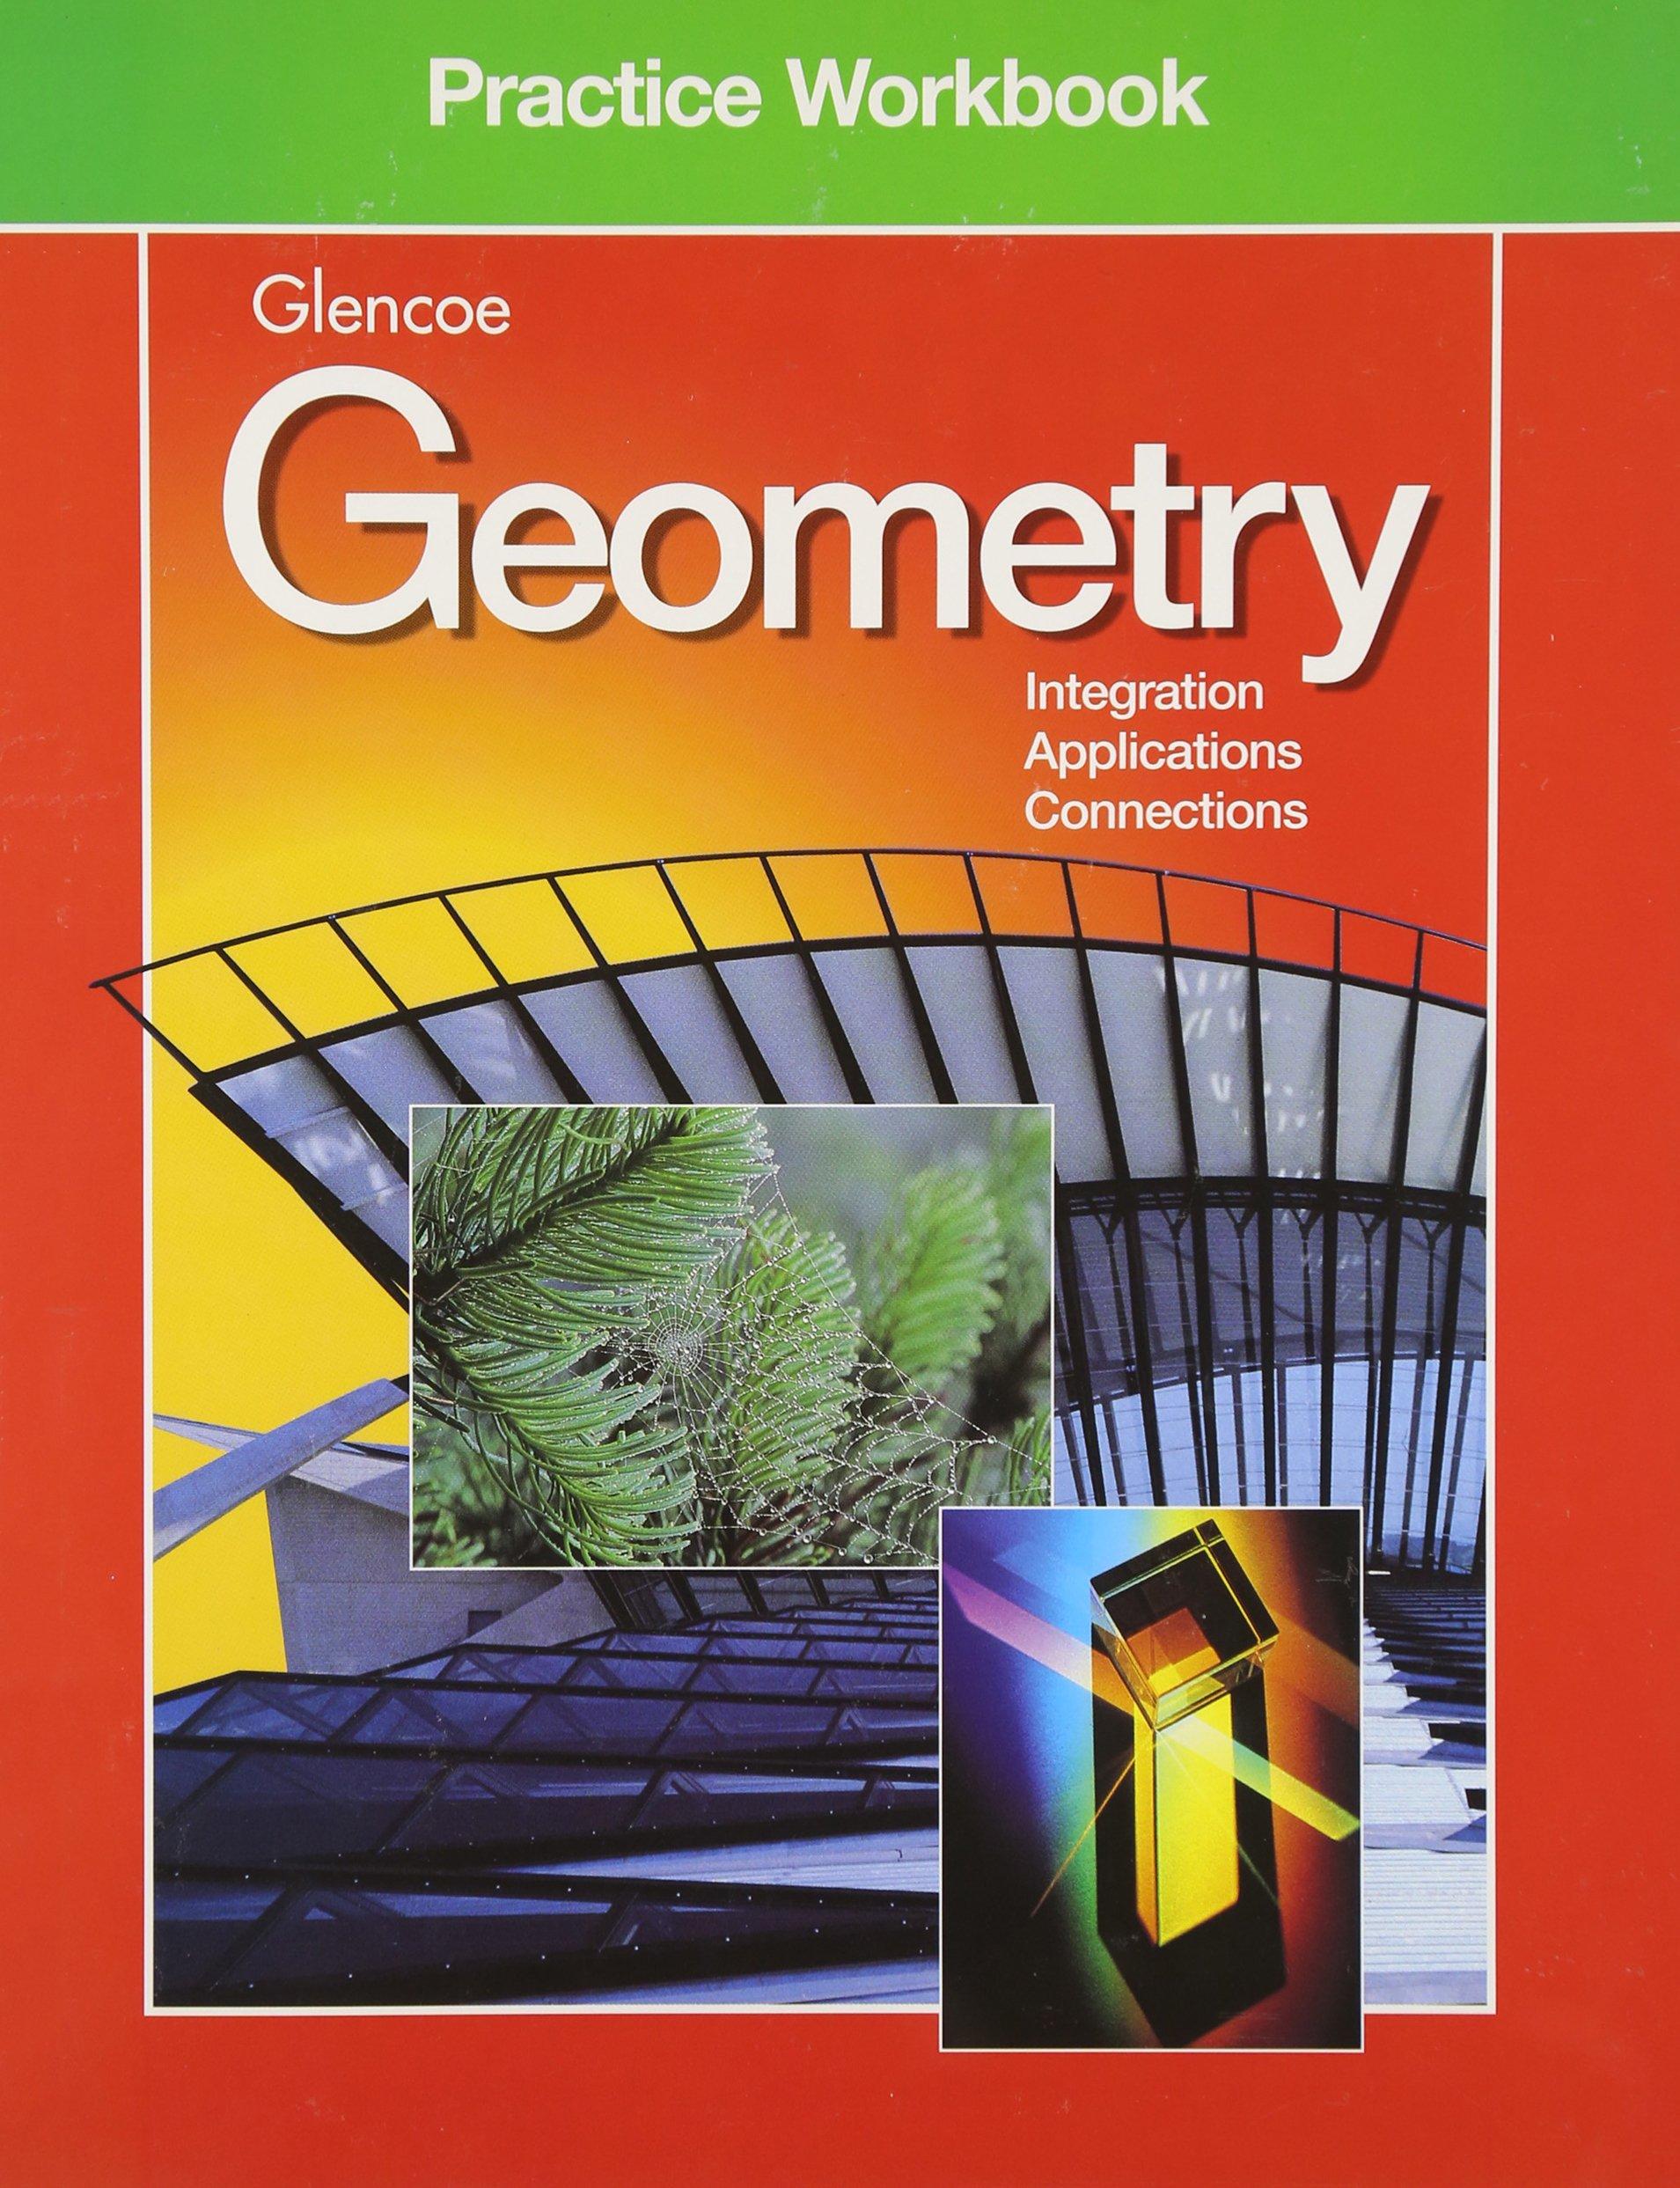 Glencoe Geometry Textbook Pdf